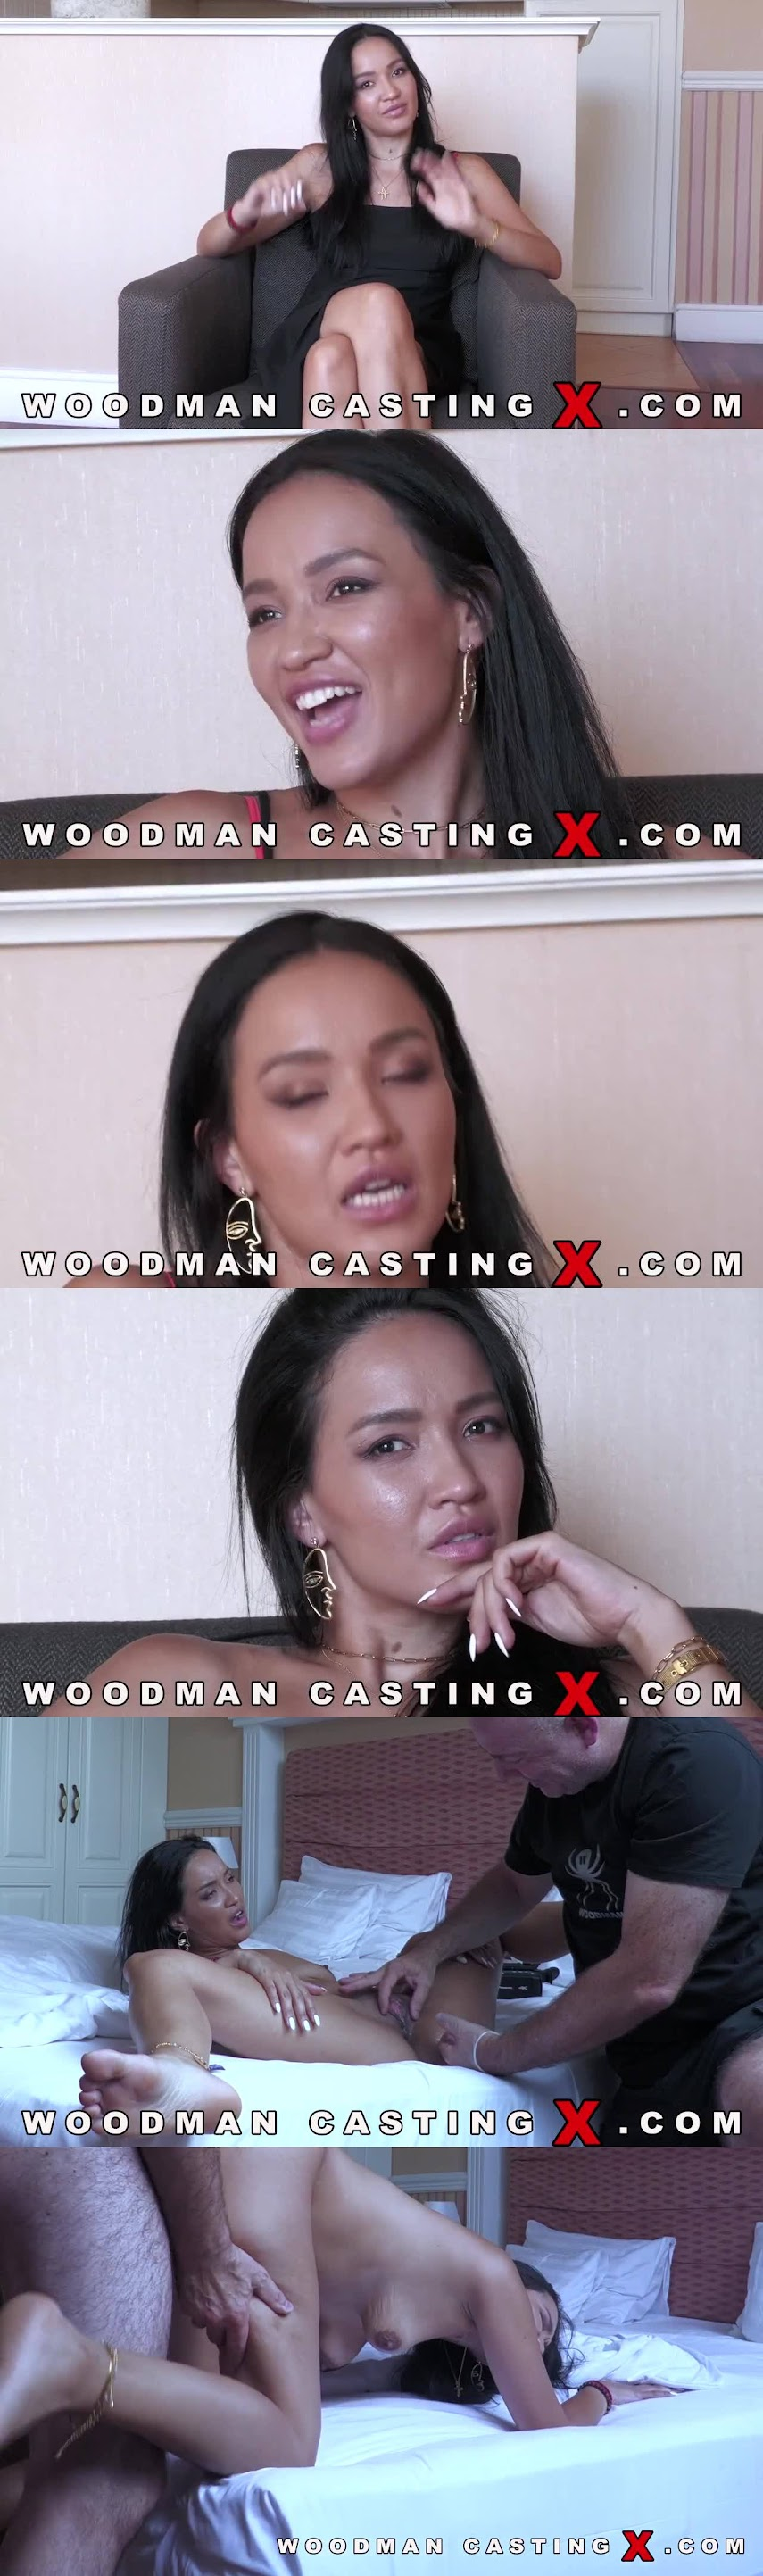 WCX Asia vargas Anal Porn casting sexy girls image jav